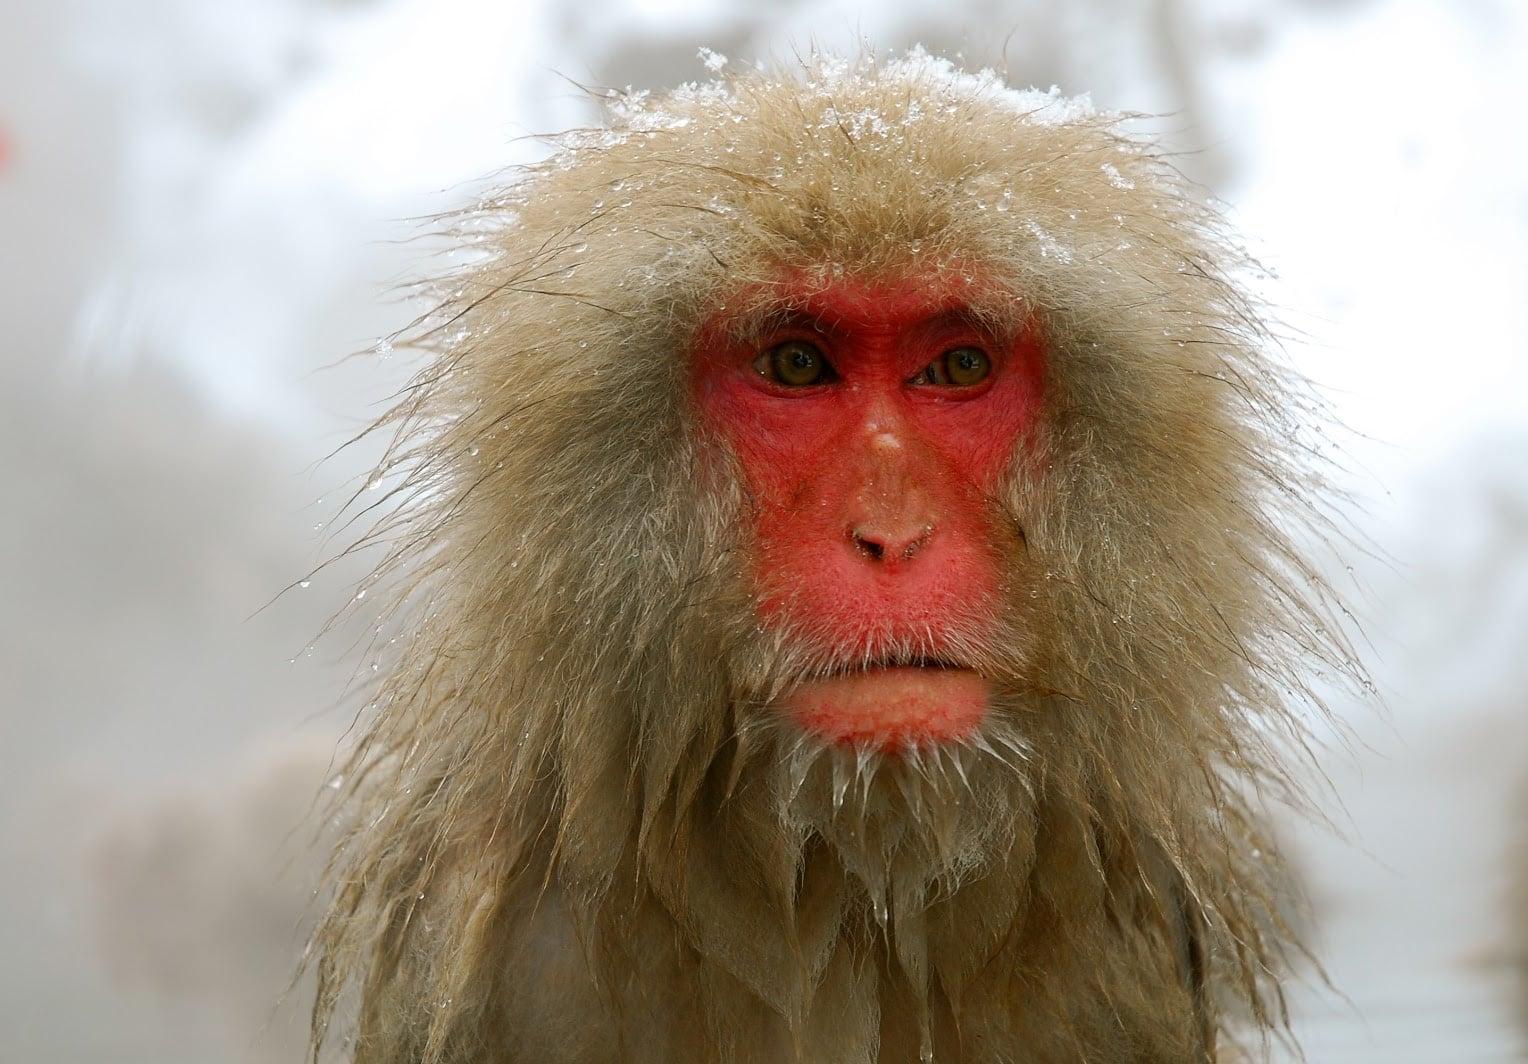 Snow Monkey, Yudanaka, Japan 2013